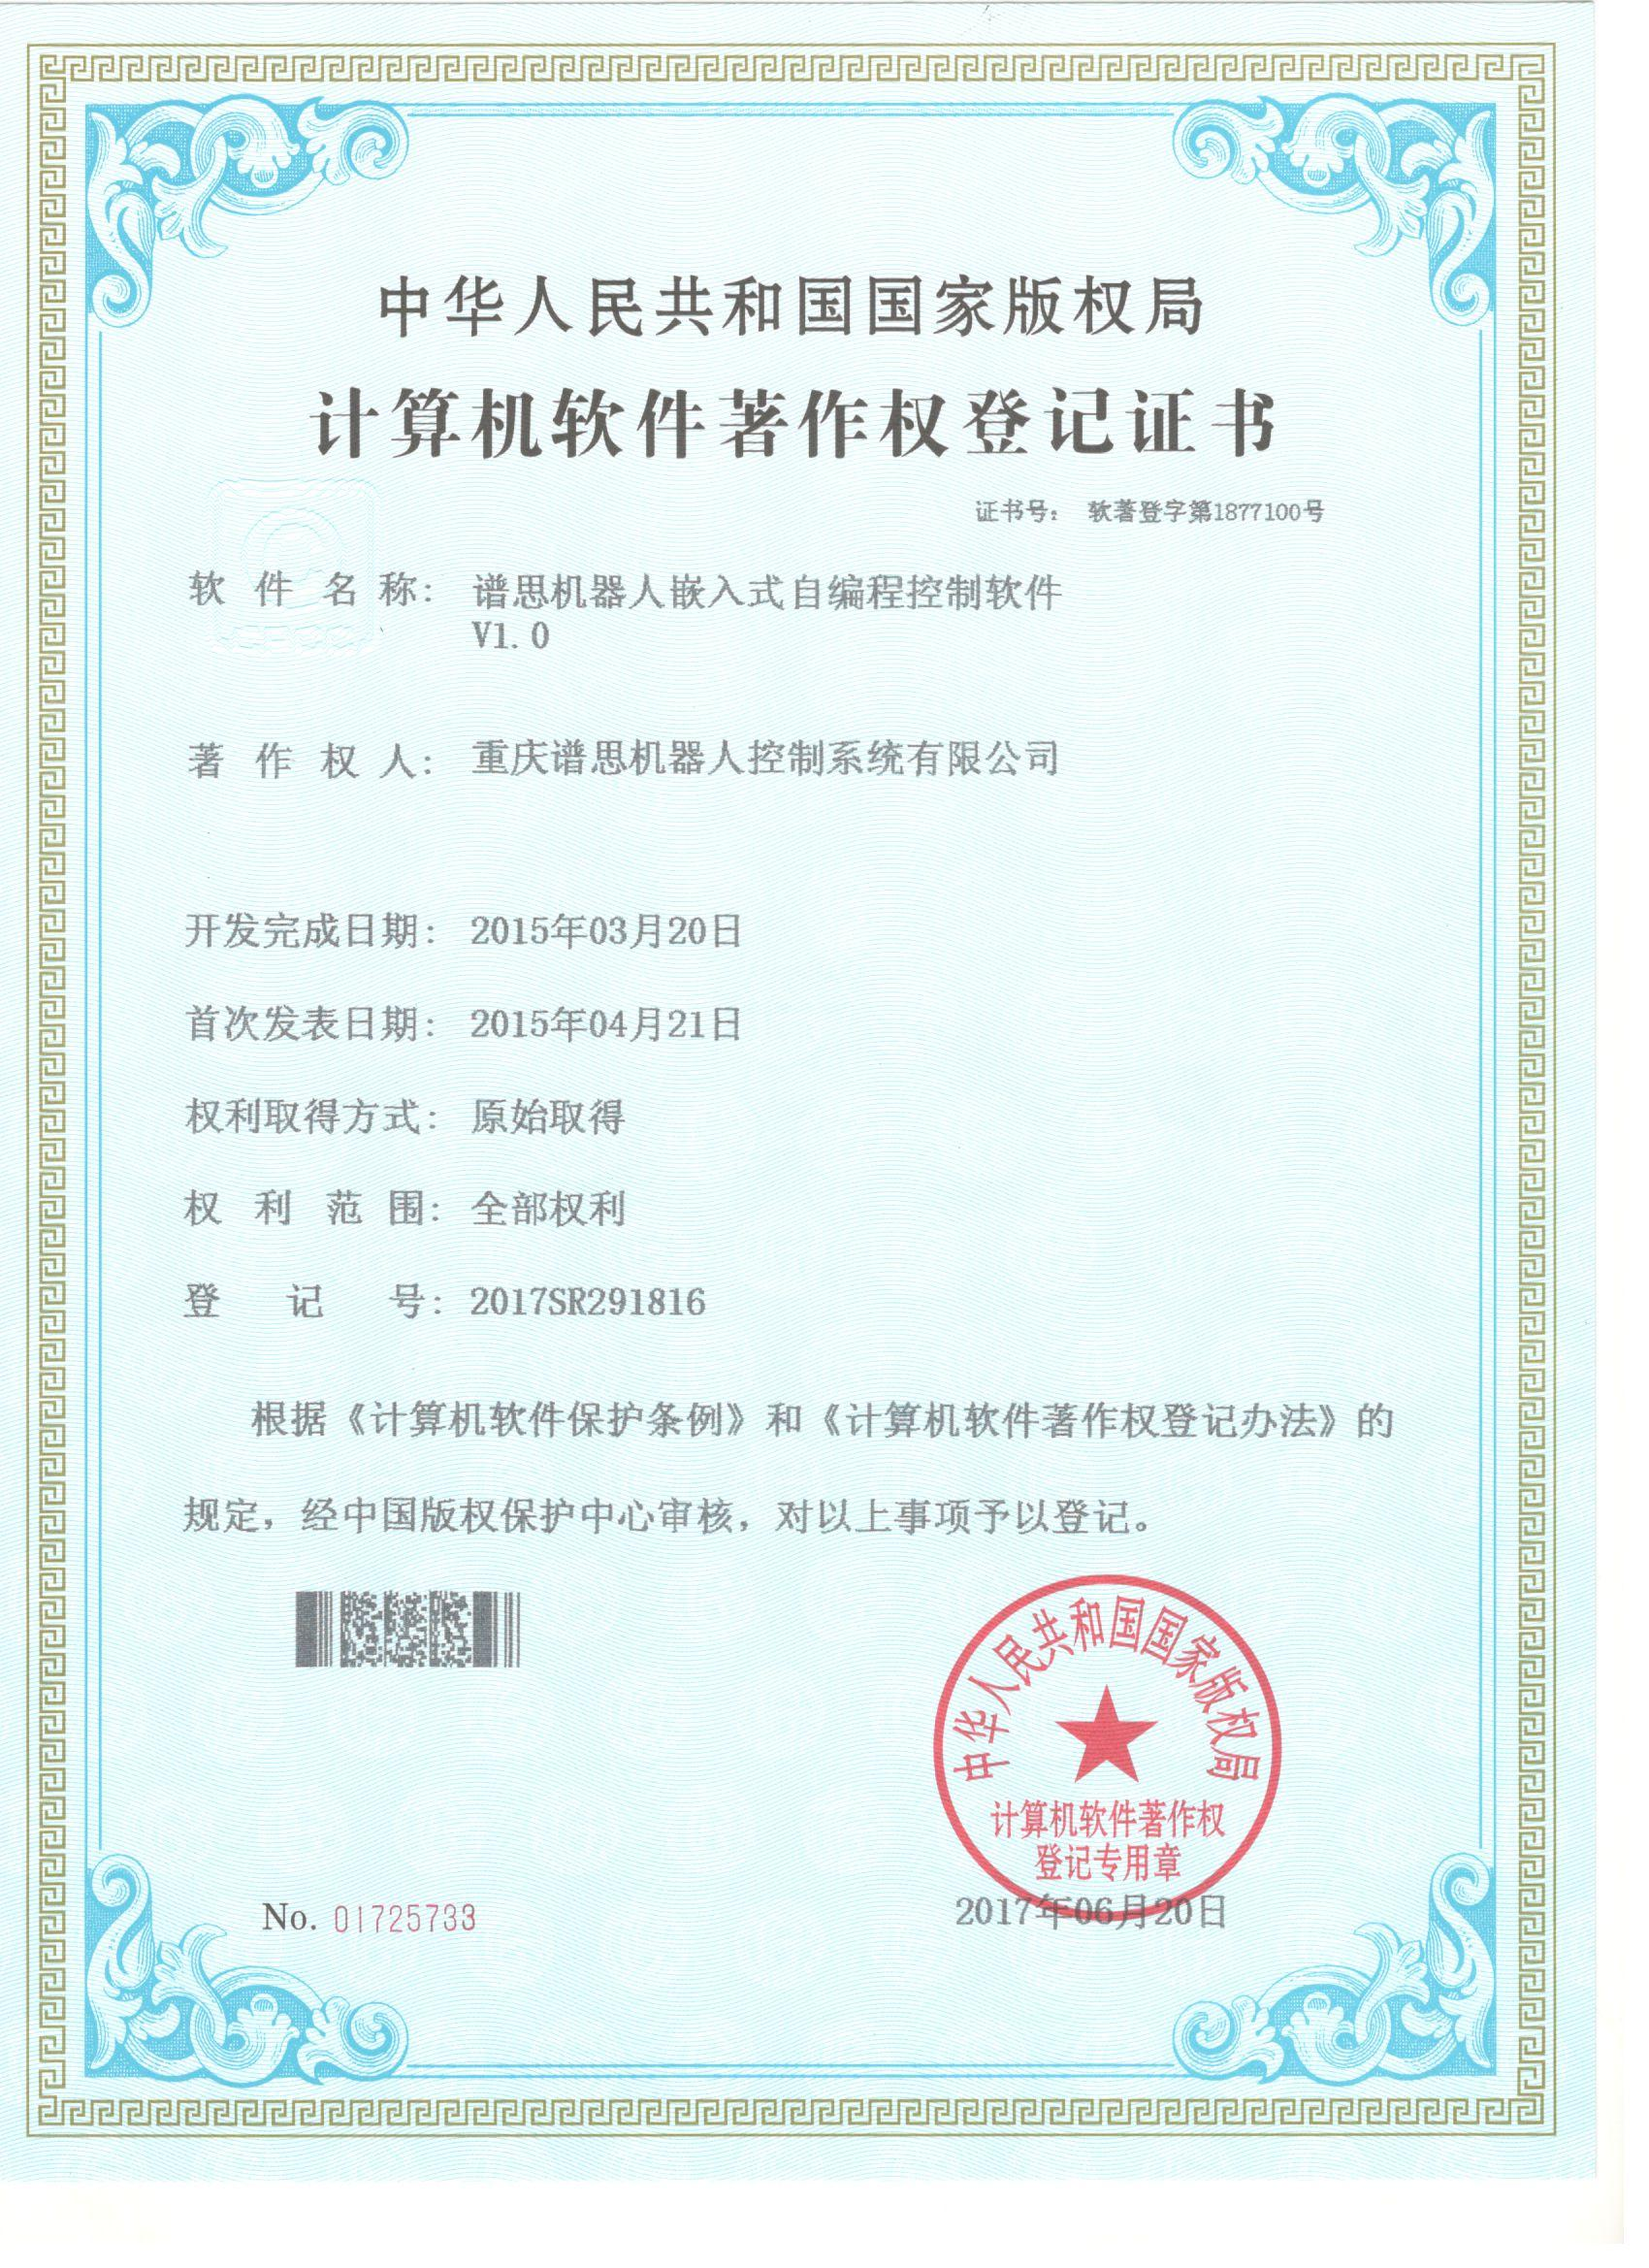 Copyright registration certificate of embedded software banner